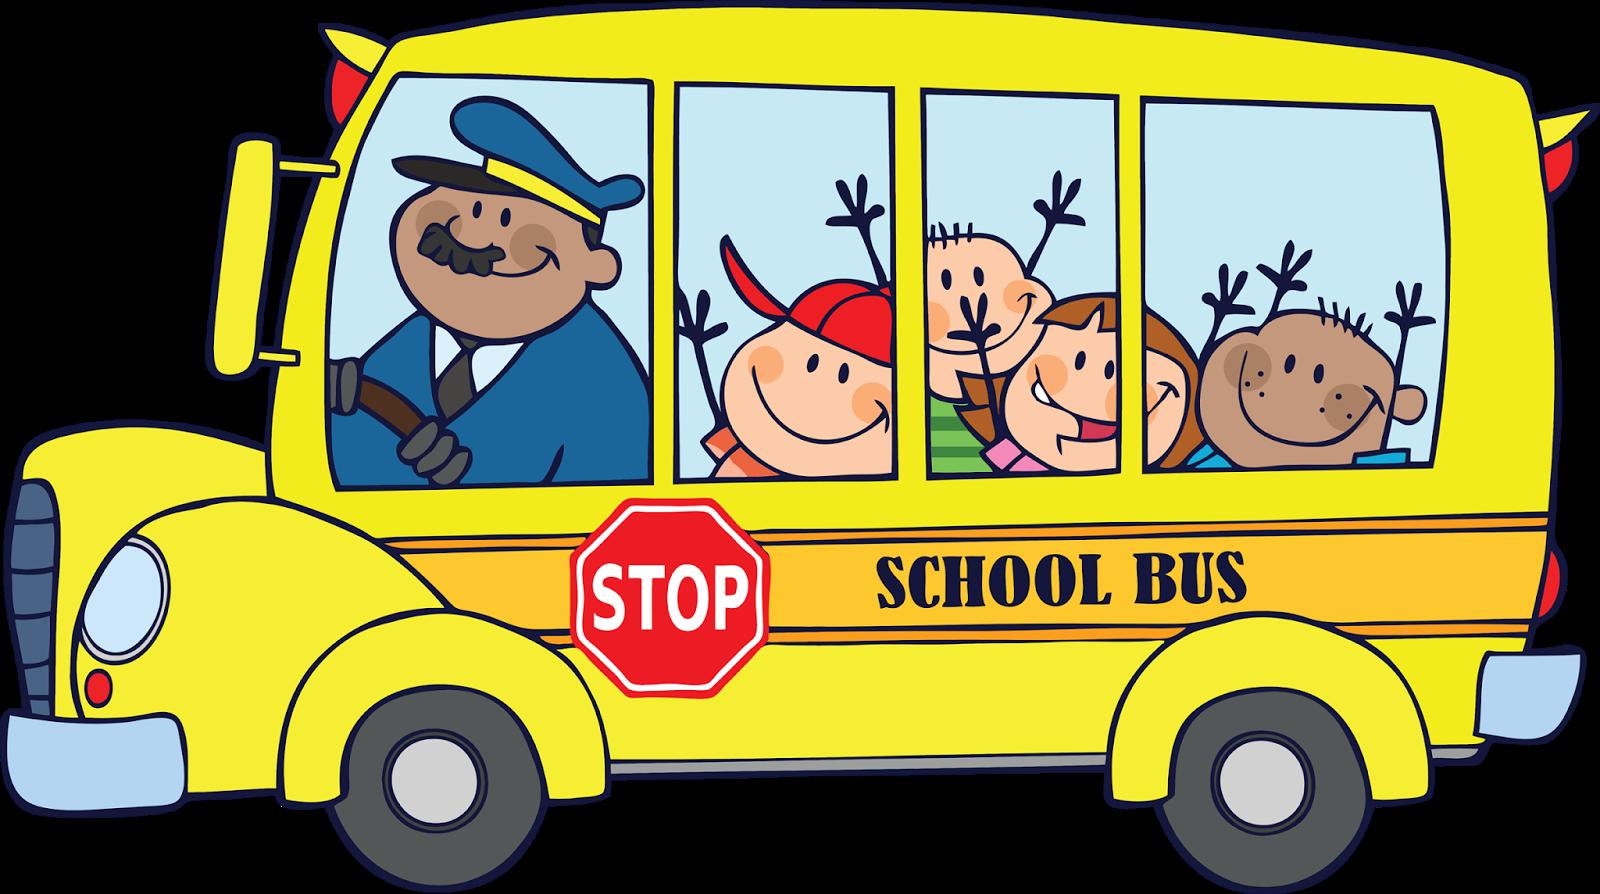 lee public schools 2017 2018 bus schedules rh lpsdistrict blogspot com School Bus Crash in Columbia South Carolina School Bus Crash Kills 4